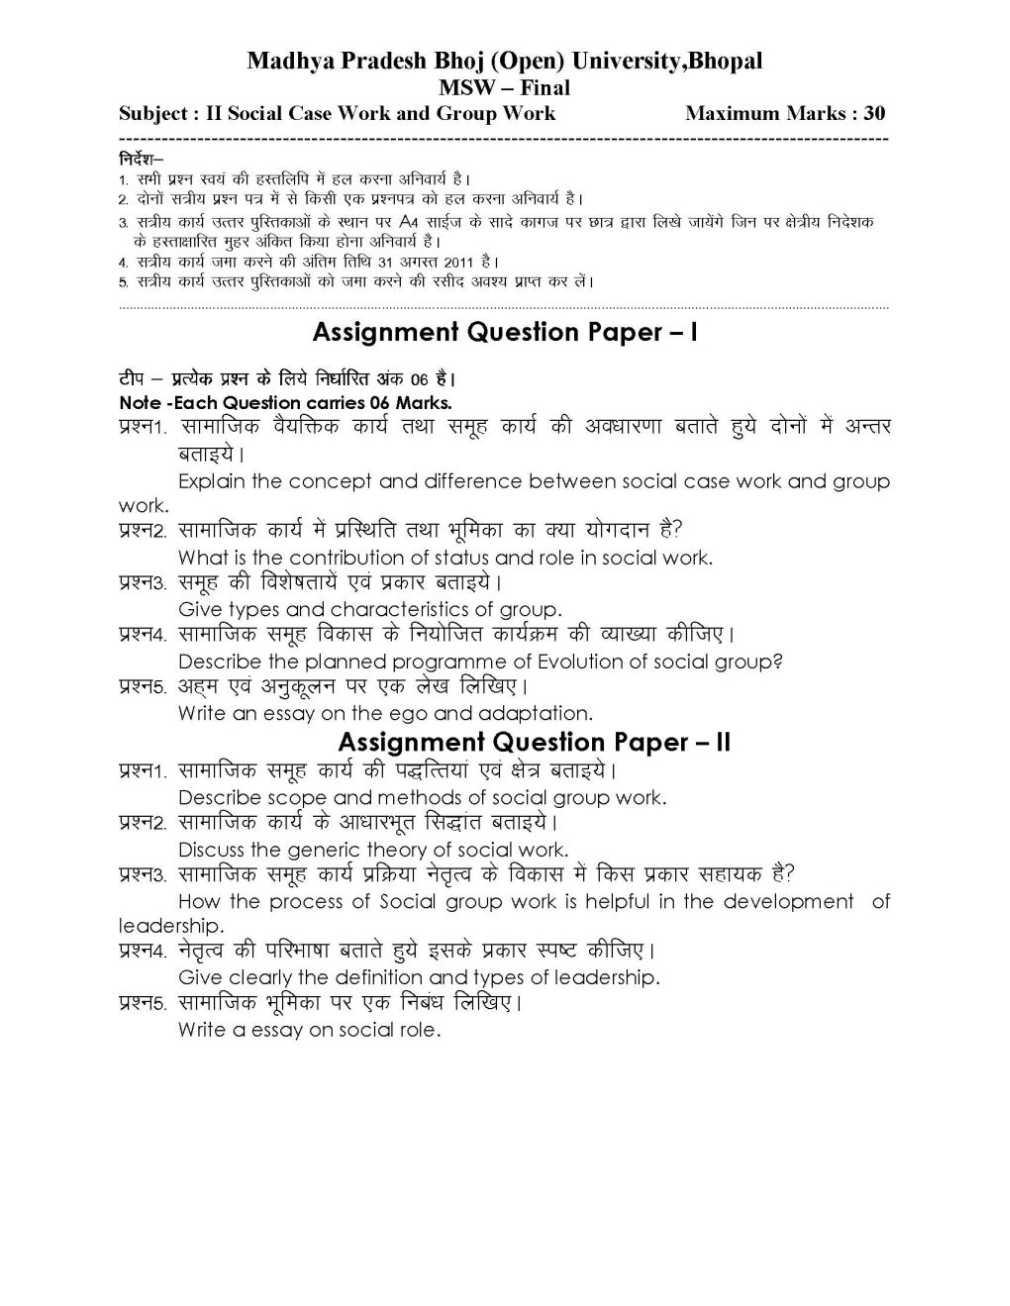 009 Leadership Essays Essay Example Bhoj University Bhopal Msw Striking Mba Samples Pdf Full